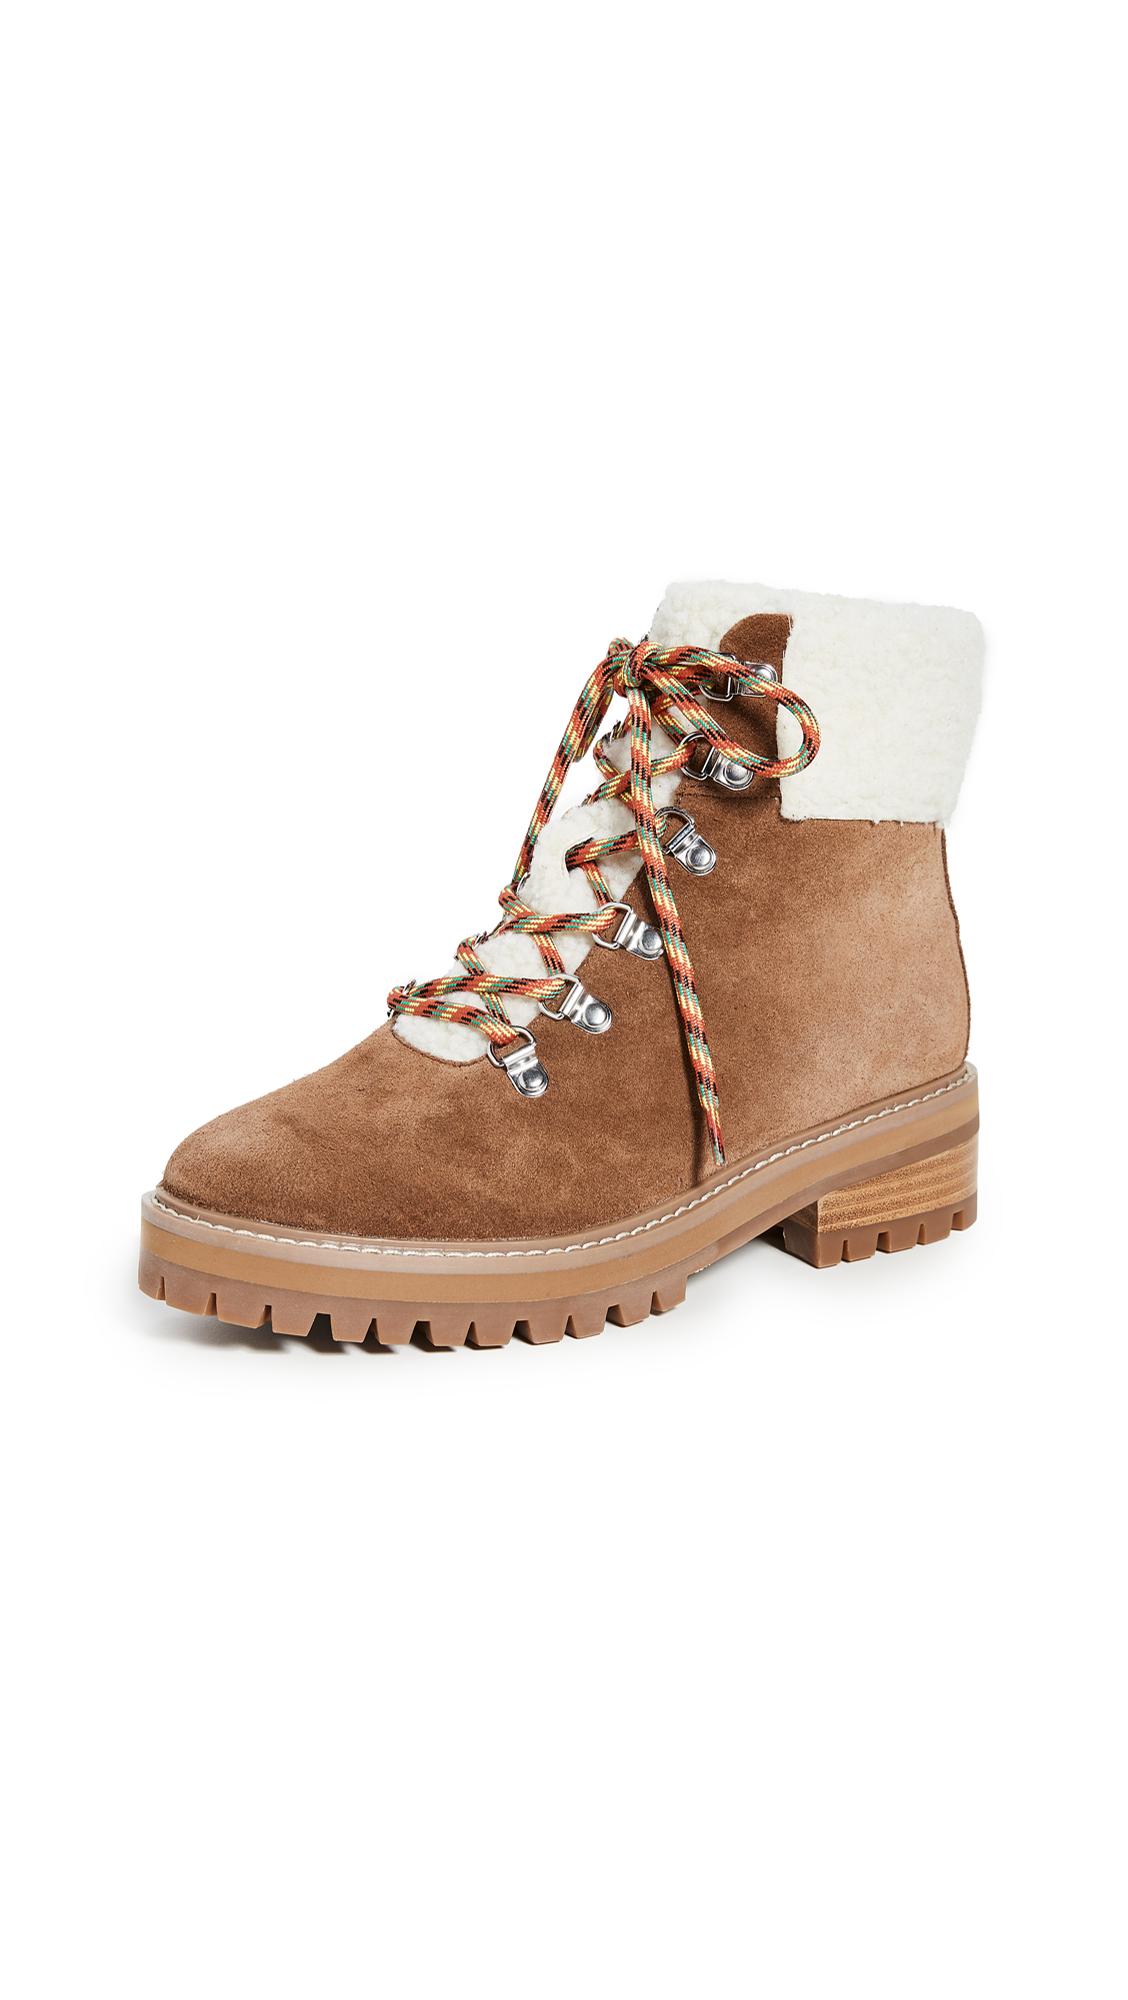 Villa Rouge Miloh Hiking Boots - 50% Off Sale